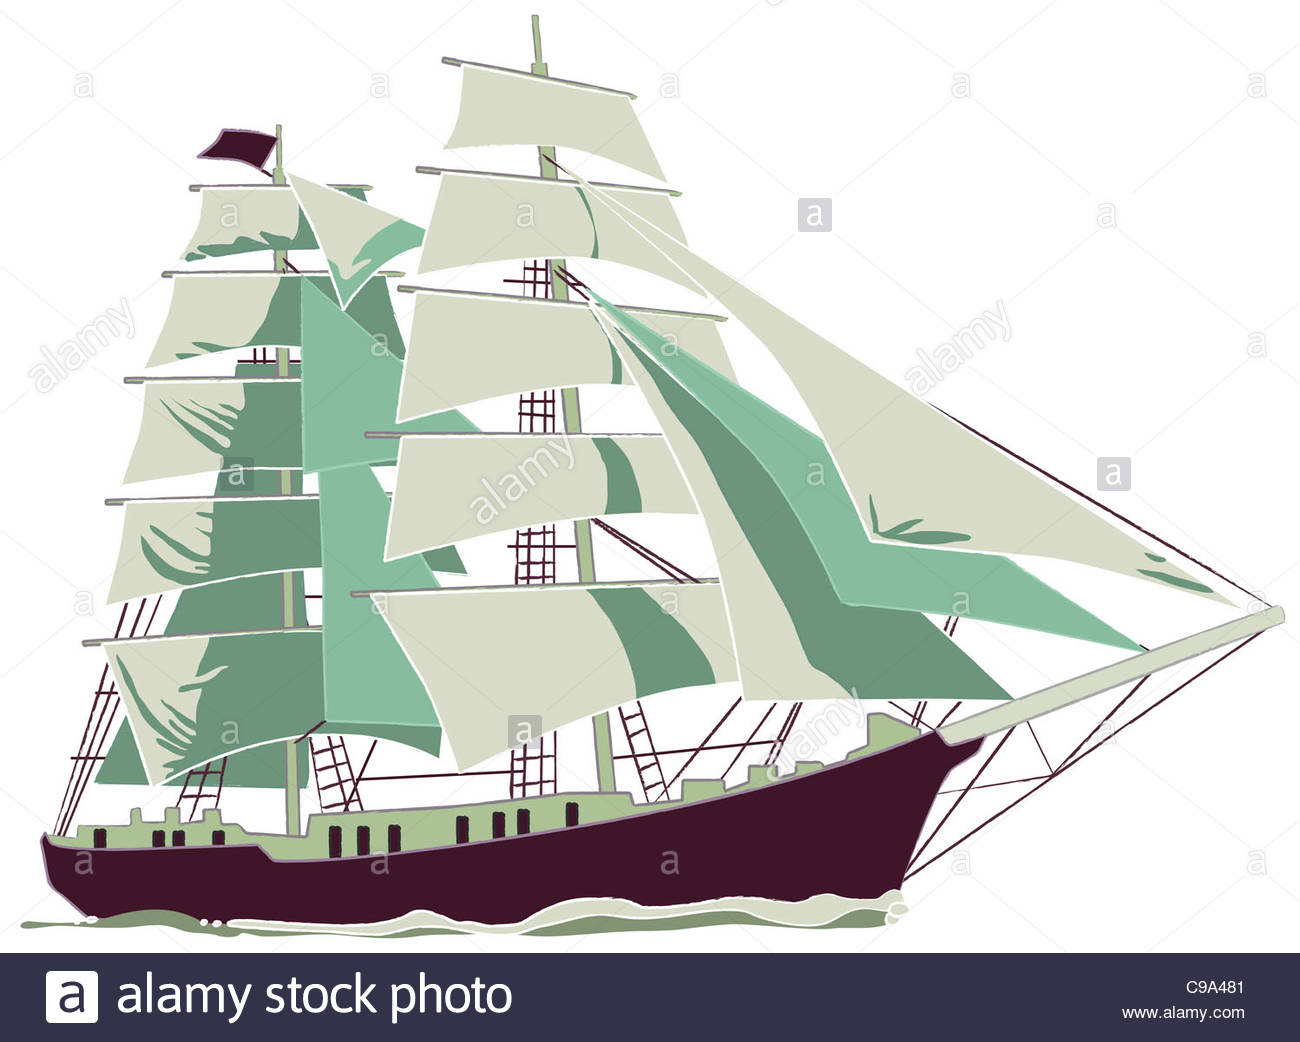 ship Sailing wind Weather See sea seafaring wave ship Ships shipping shippi - Stock Image